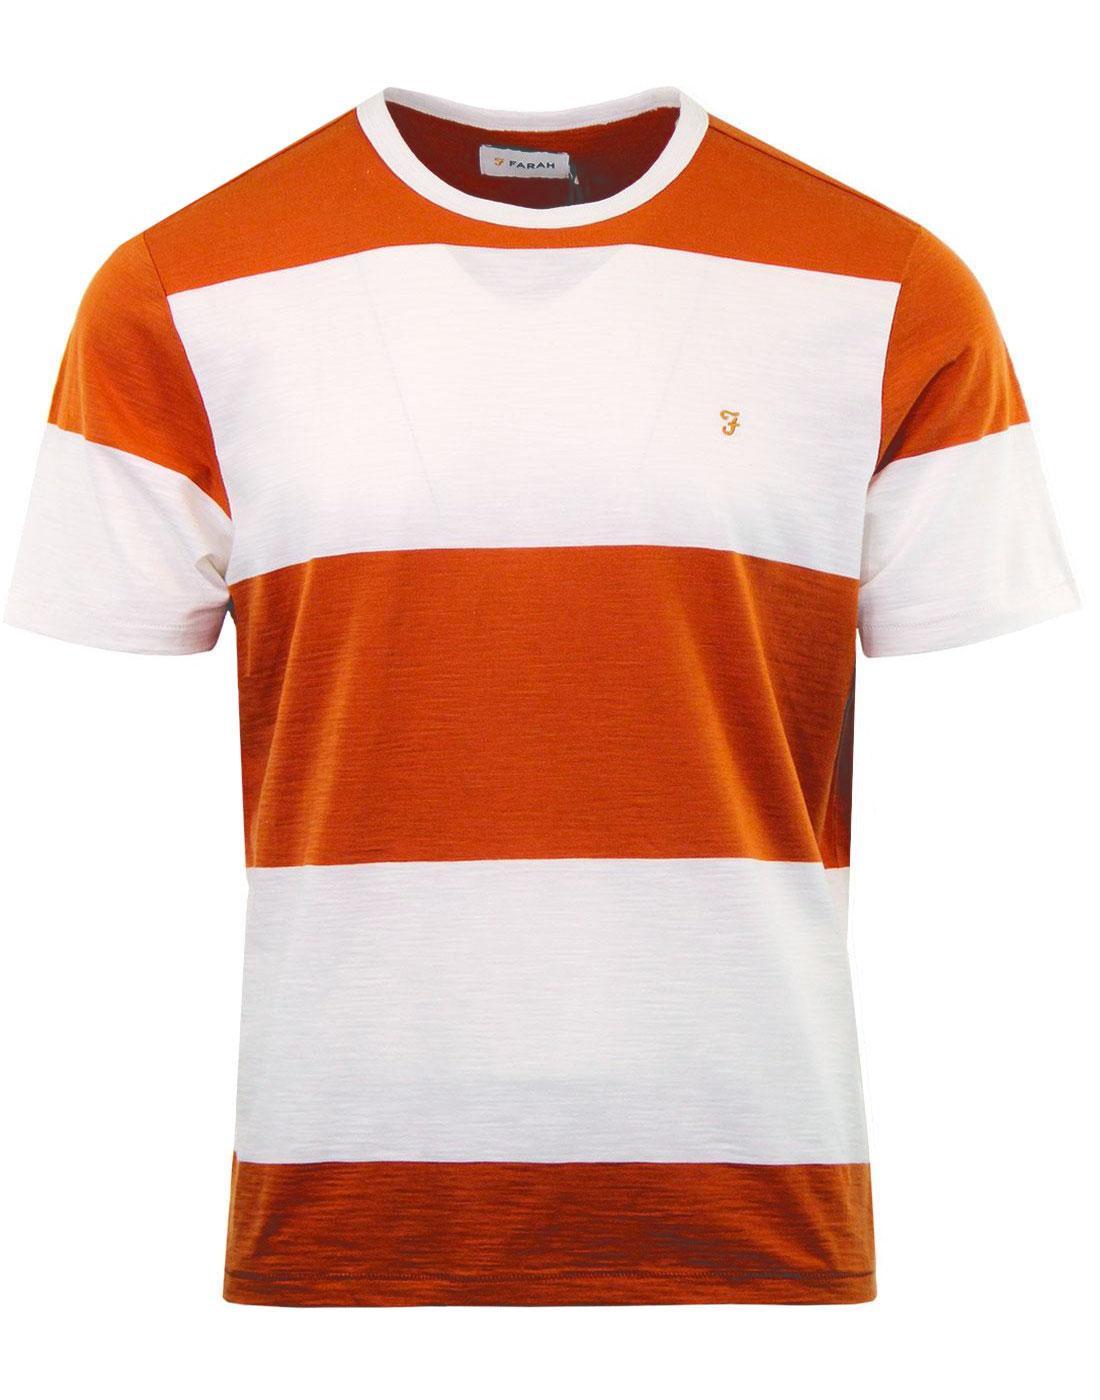 Woolacombe FARAH Retro 60s Block Stripe T-shirt O